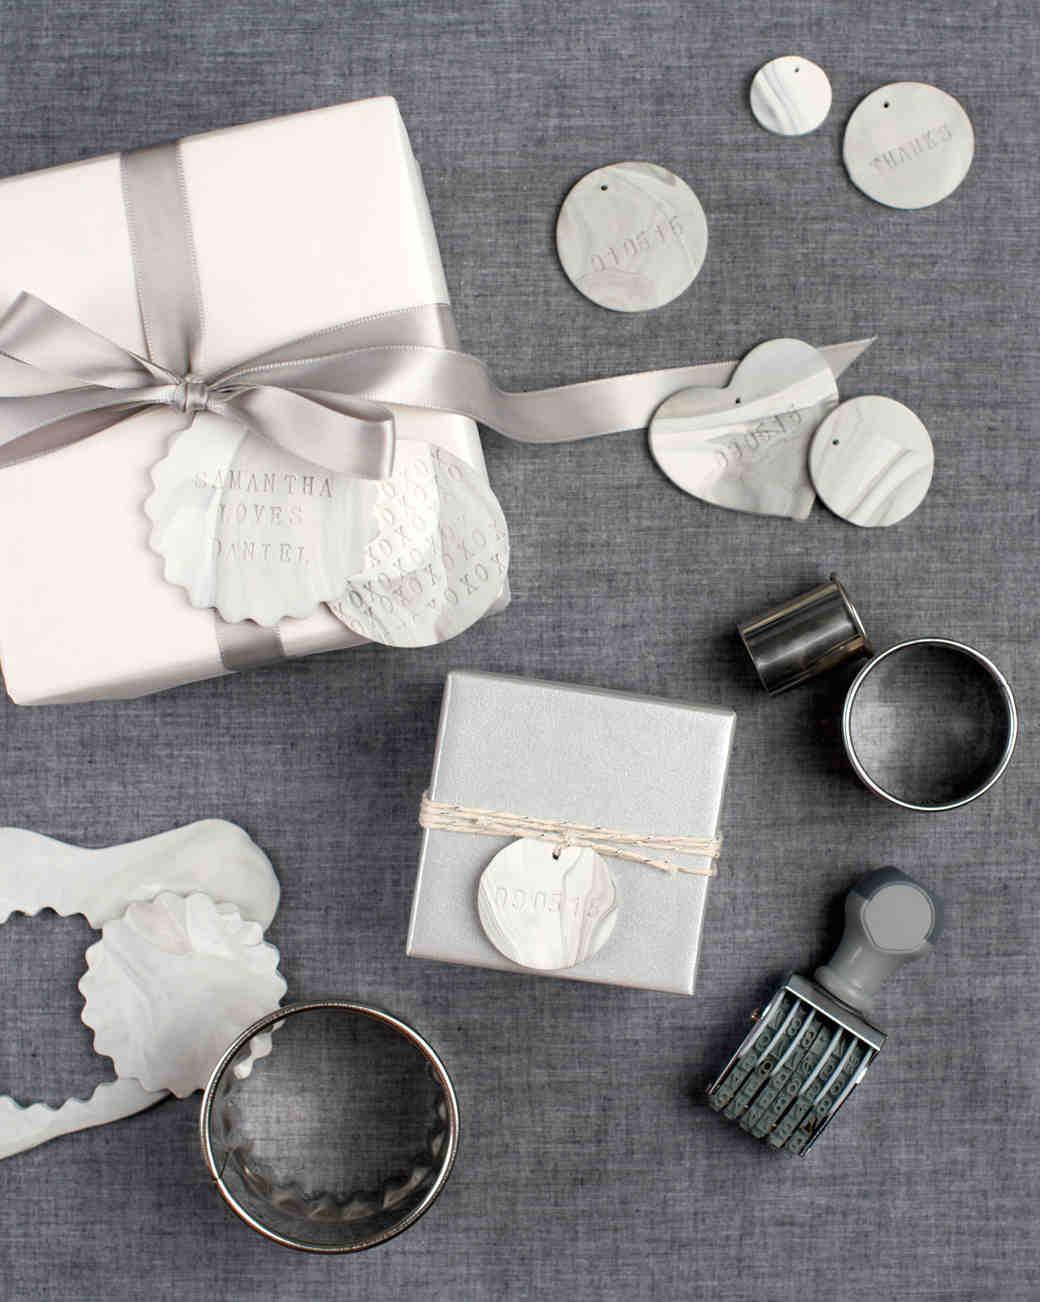 An Easy DIY: Marbleized Clay Gift Tags